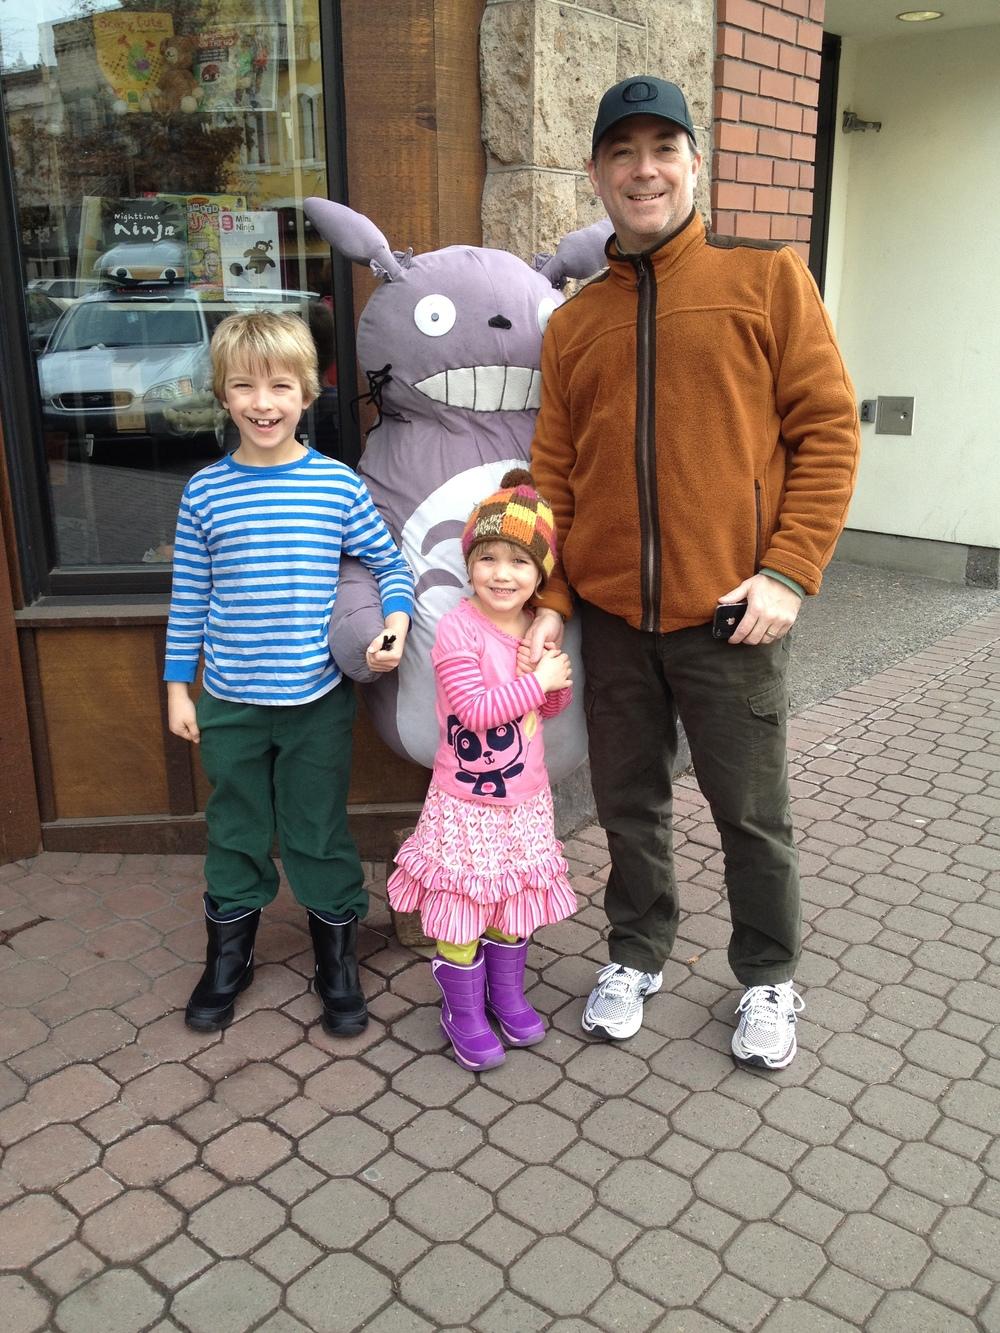 Greg_Kids_Totoro.JPG